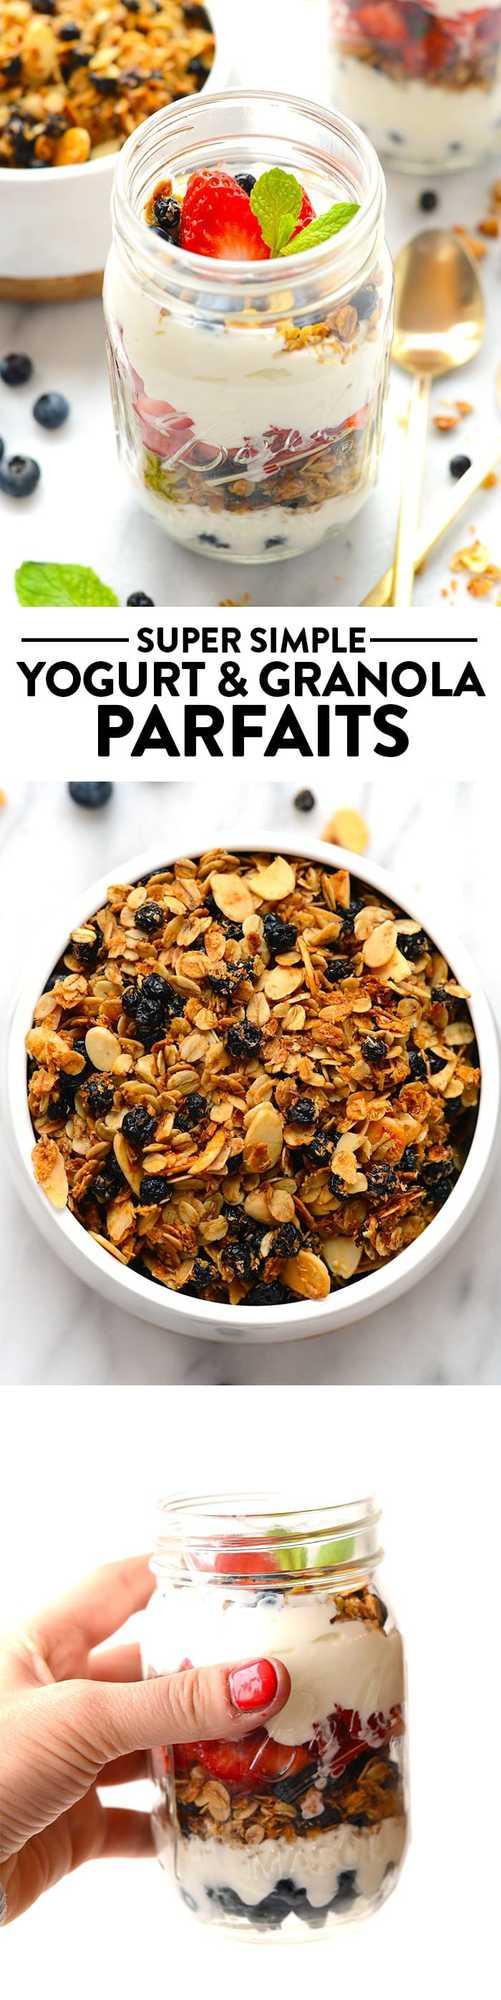 Layer up Greek yogurt, fresh berries, and your favorite homemade granola for the simplest mason jar parfait breakfast!